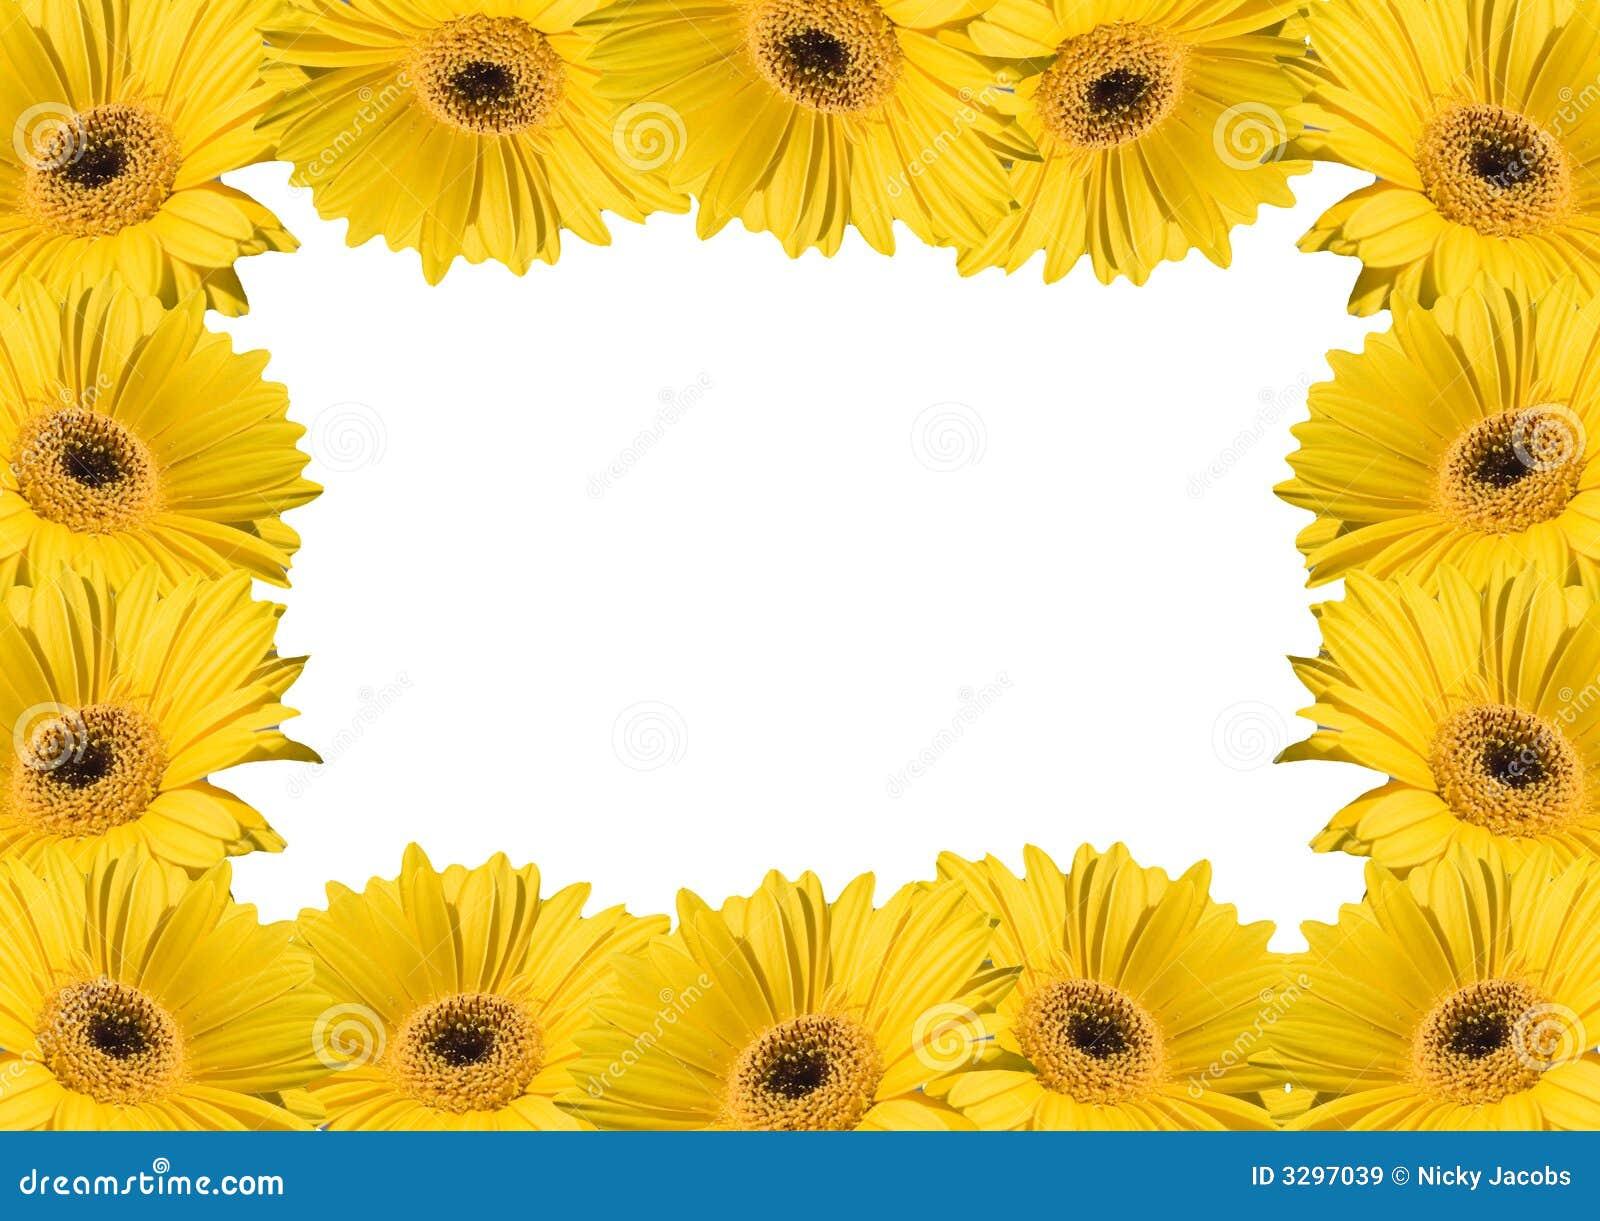 Flower Background Frames Stock Photo 3297039 - Megapixl